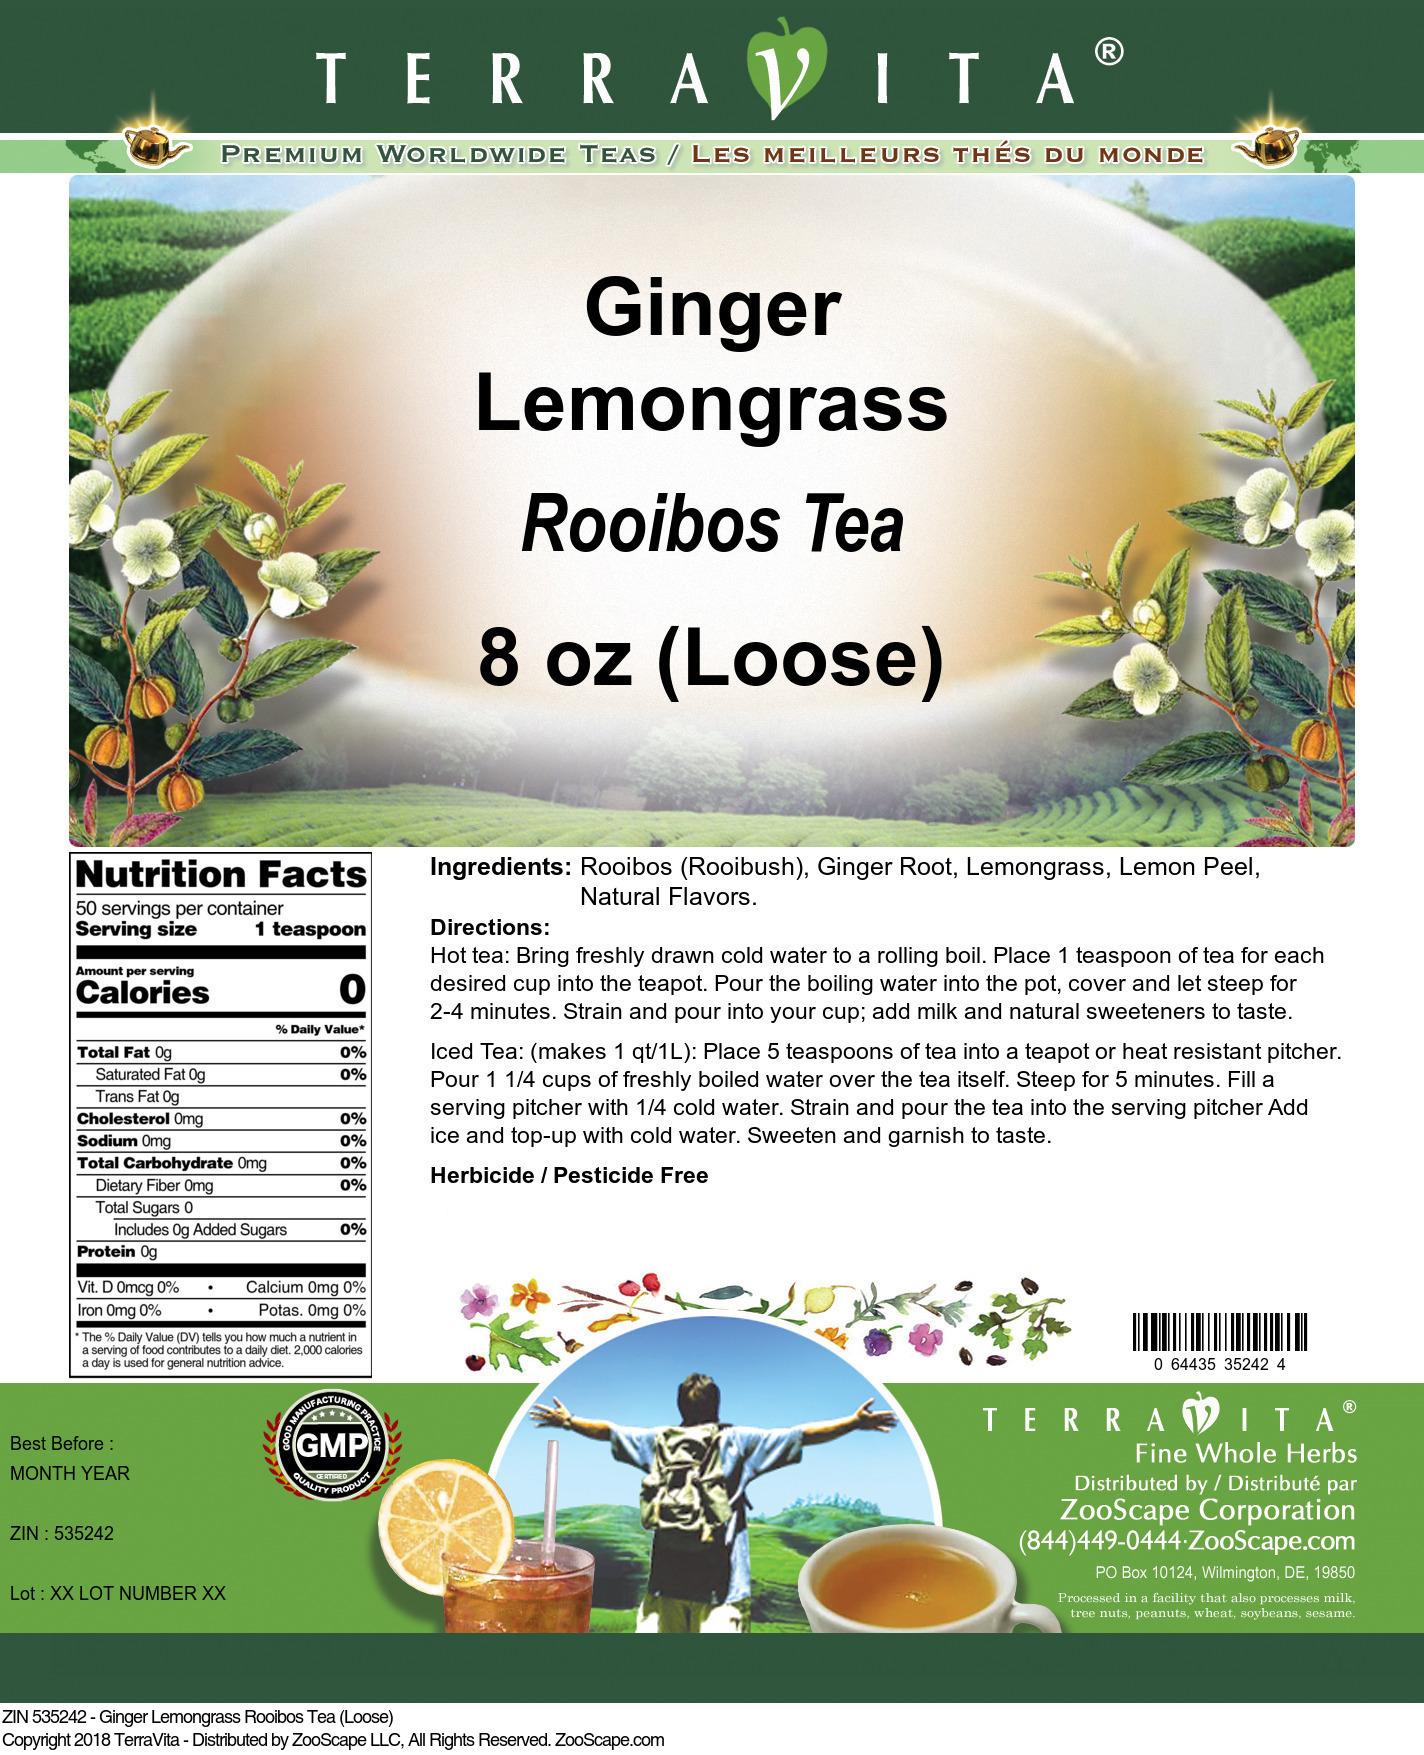 Ginger Lemongrass Rooibos Tea